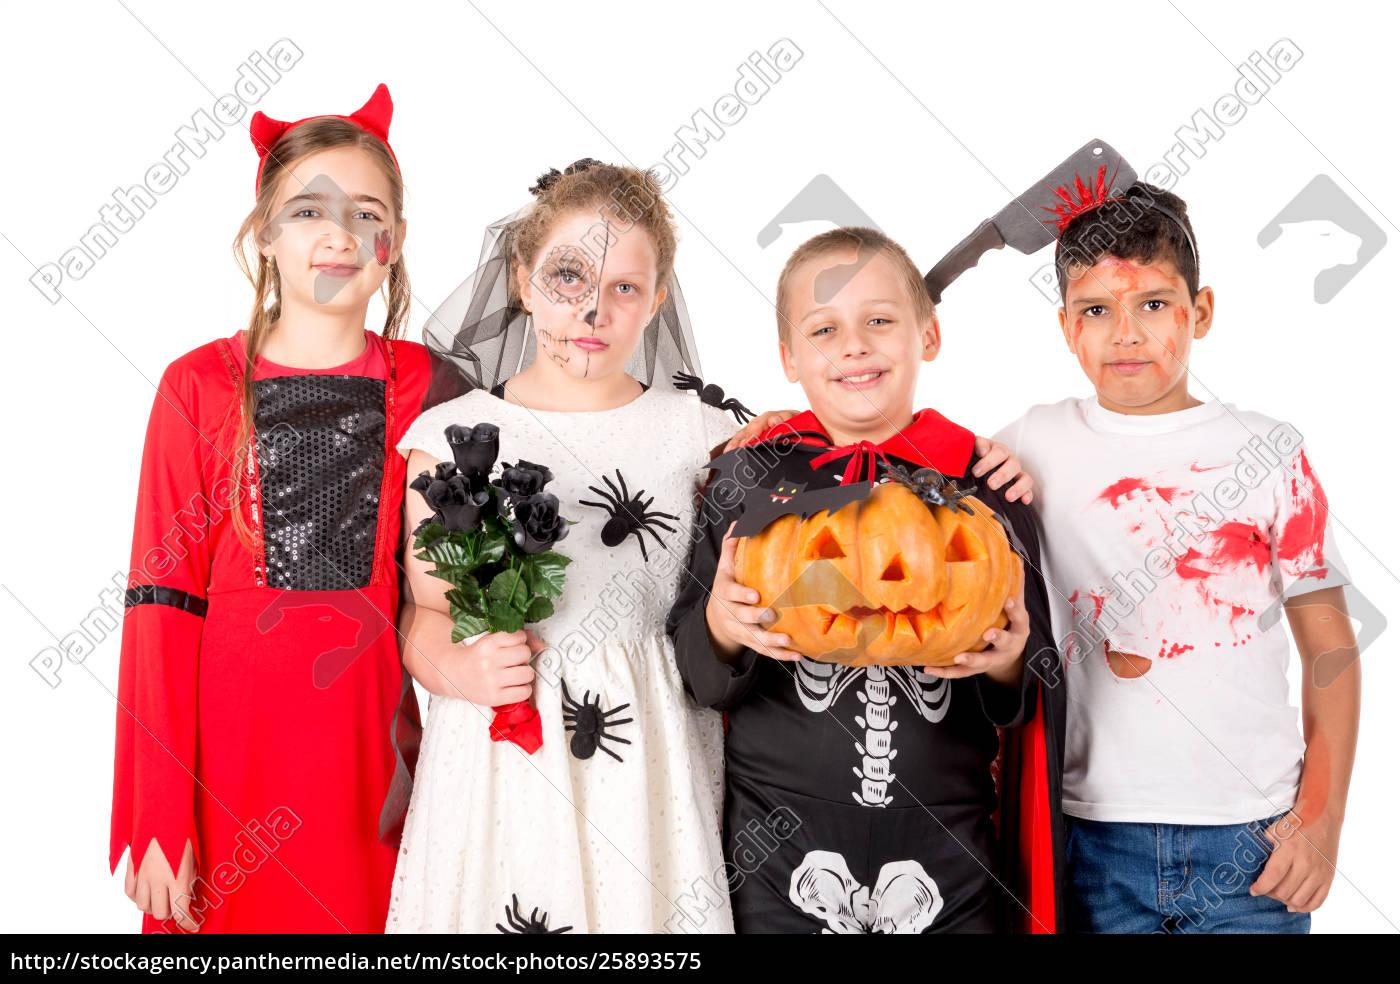 Halloween Gruppo.Lizenzfreies Bild 25893575 Gruppe Kinder In Halloween Kostumen